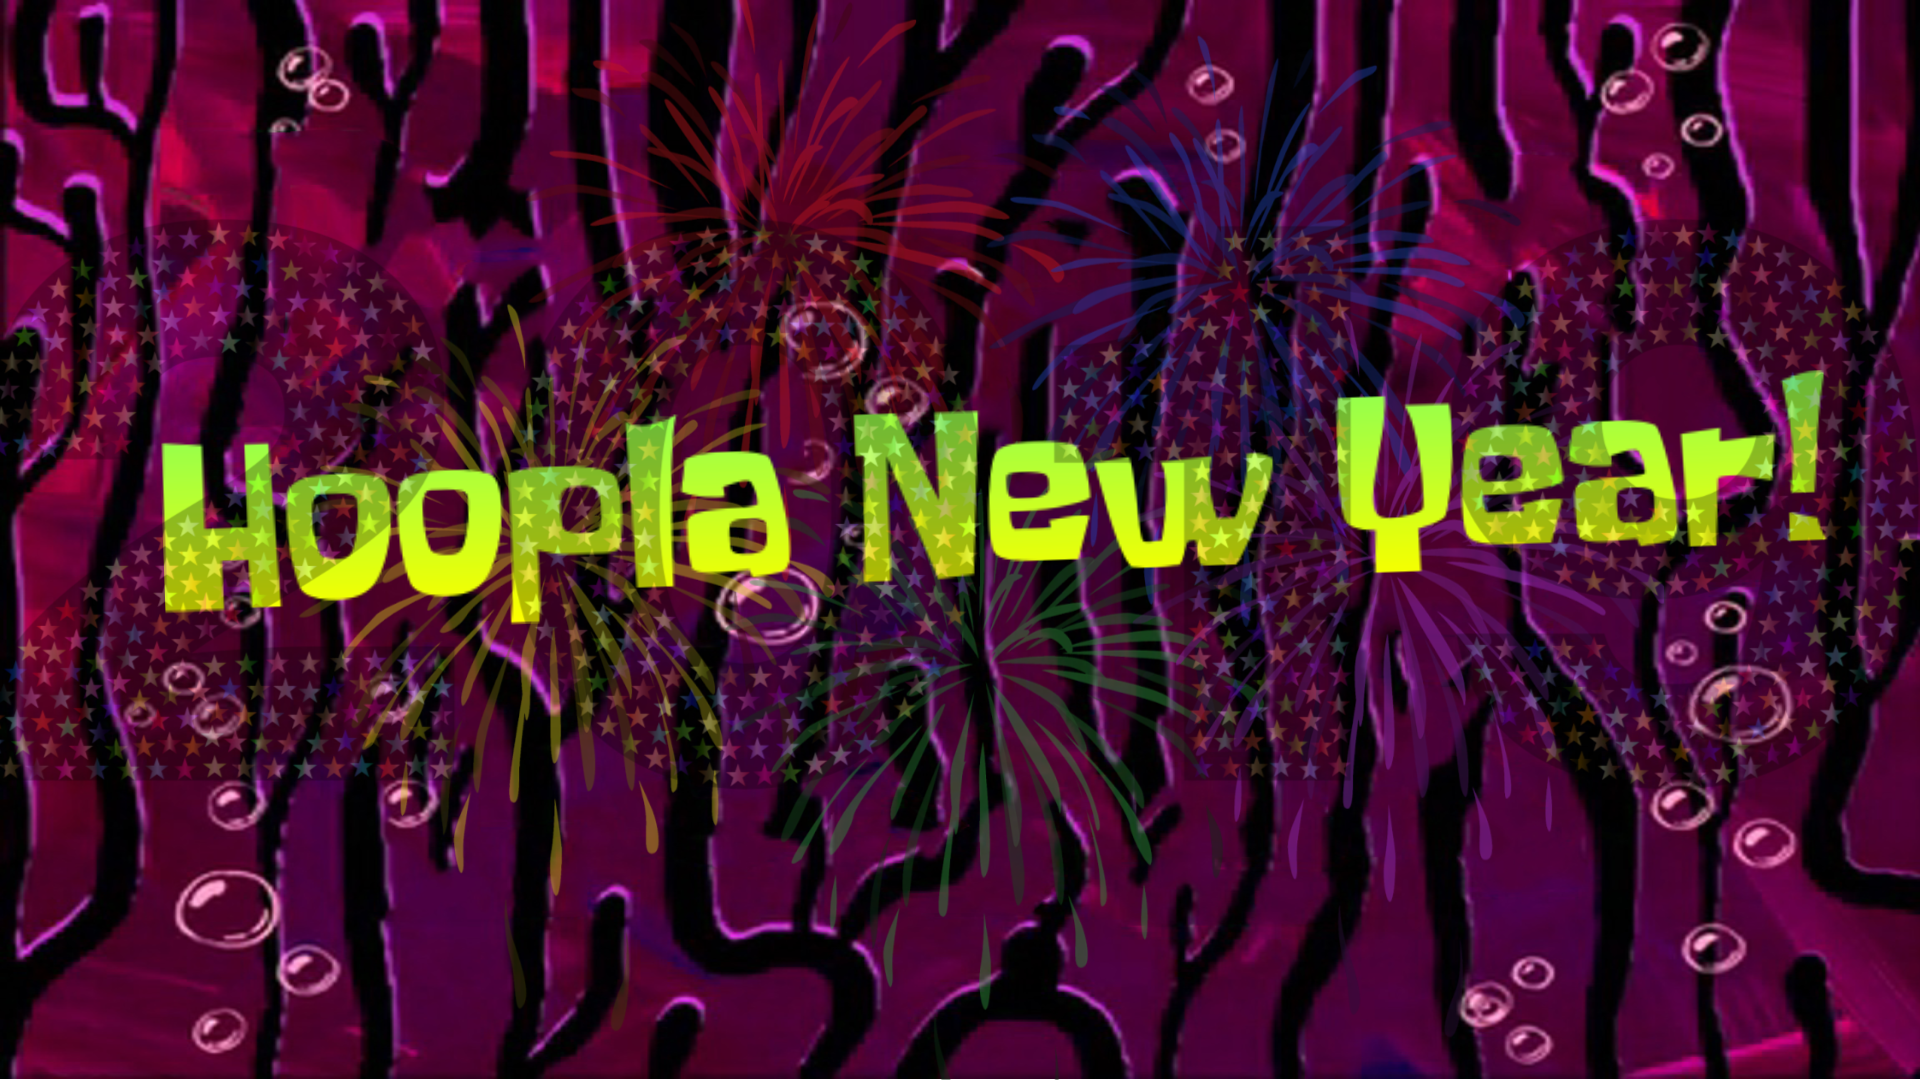 Hoopla New Year!